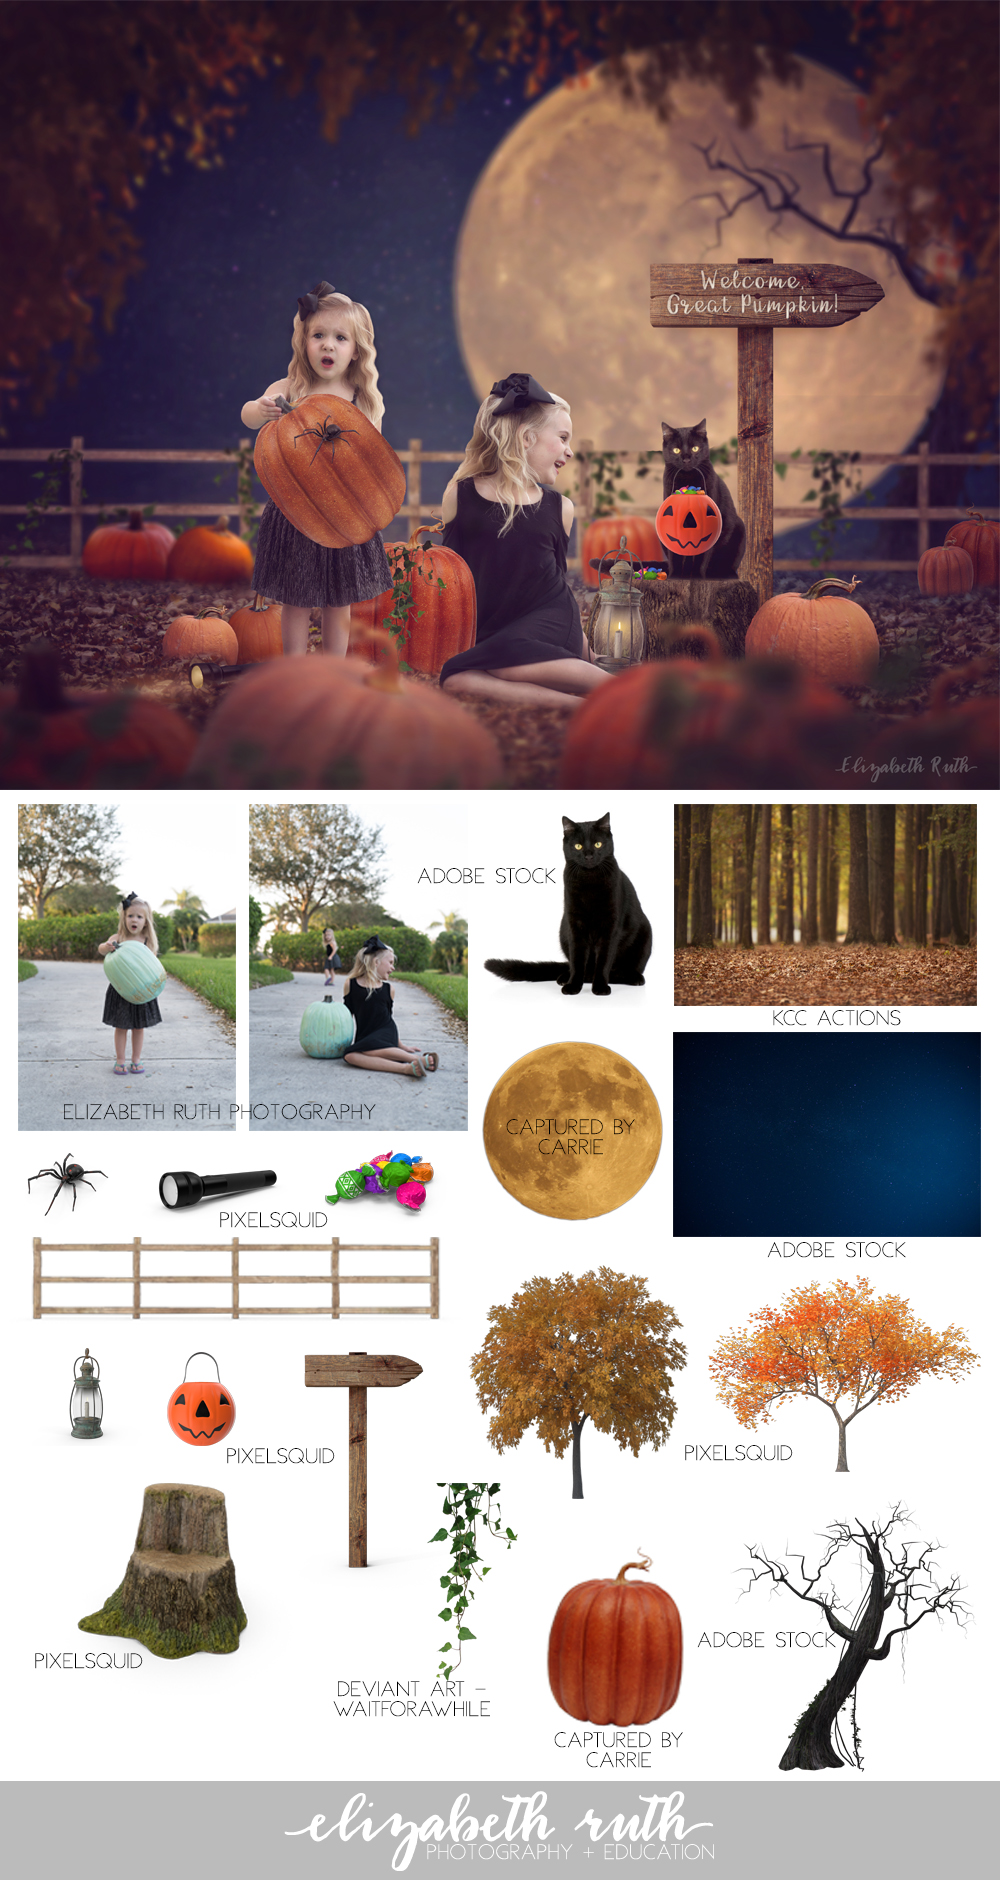 Elizabeth+Ruth+_+Photography+and+Creative+Photoshop+Composites+_+Blog+Great+Pumpkin.jpg